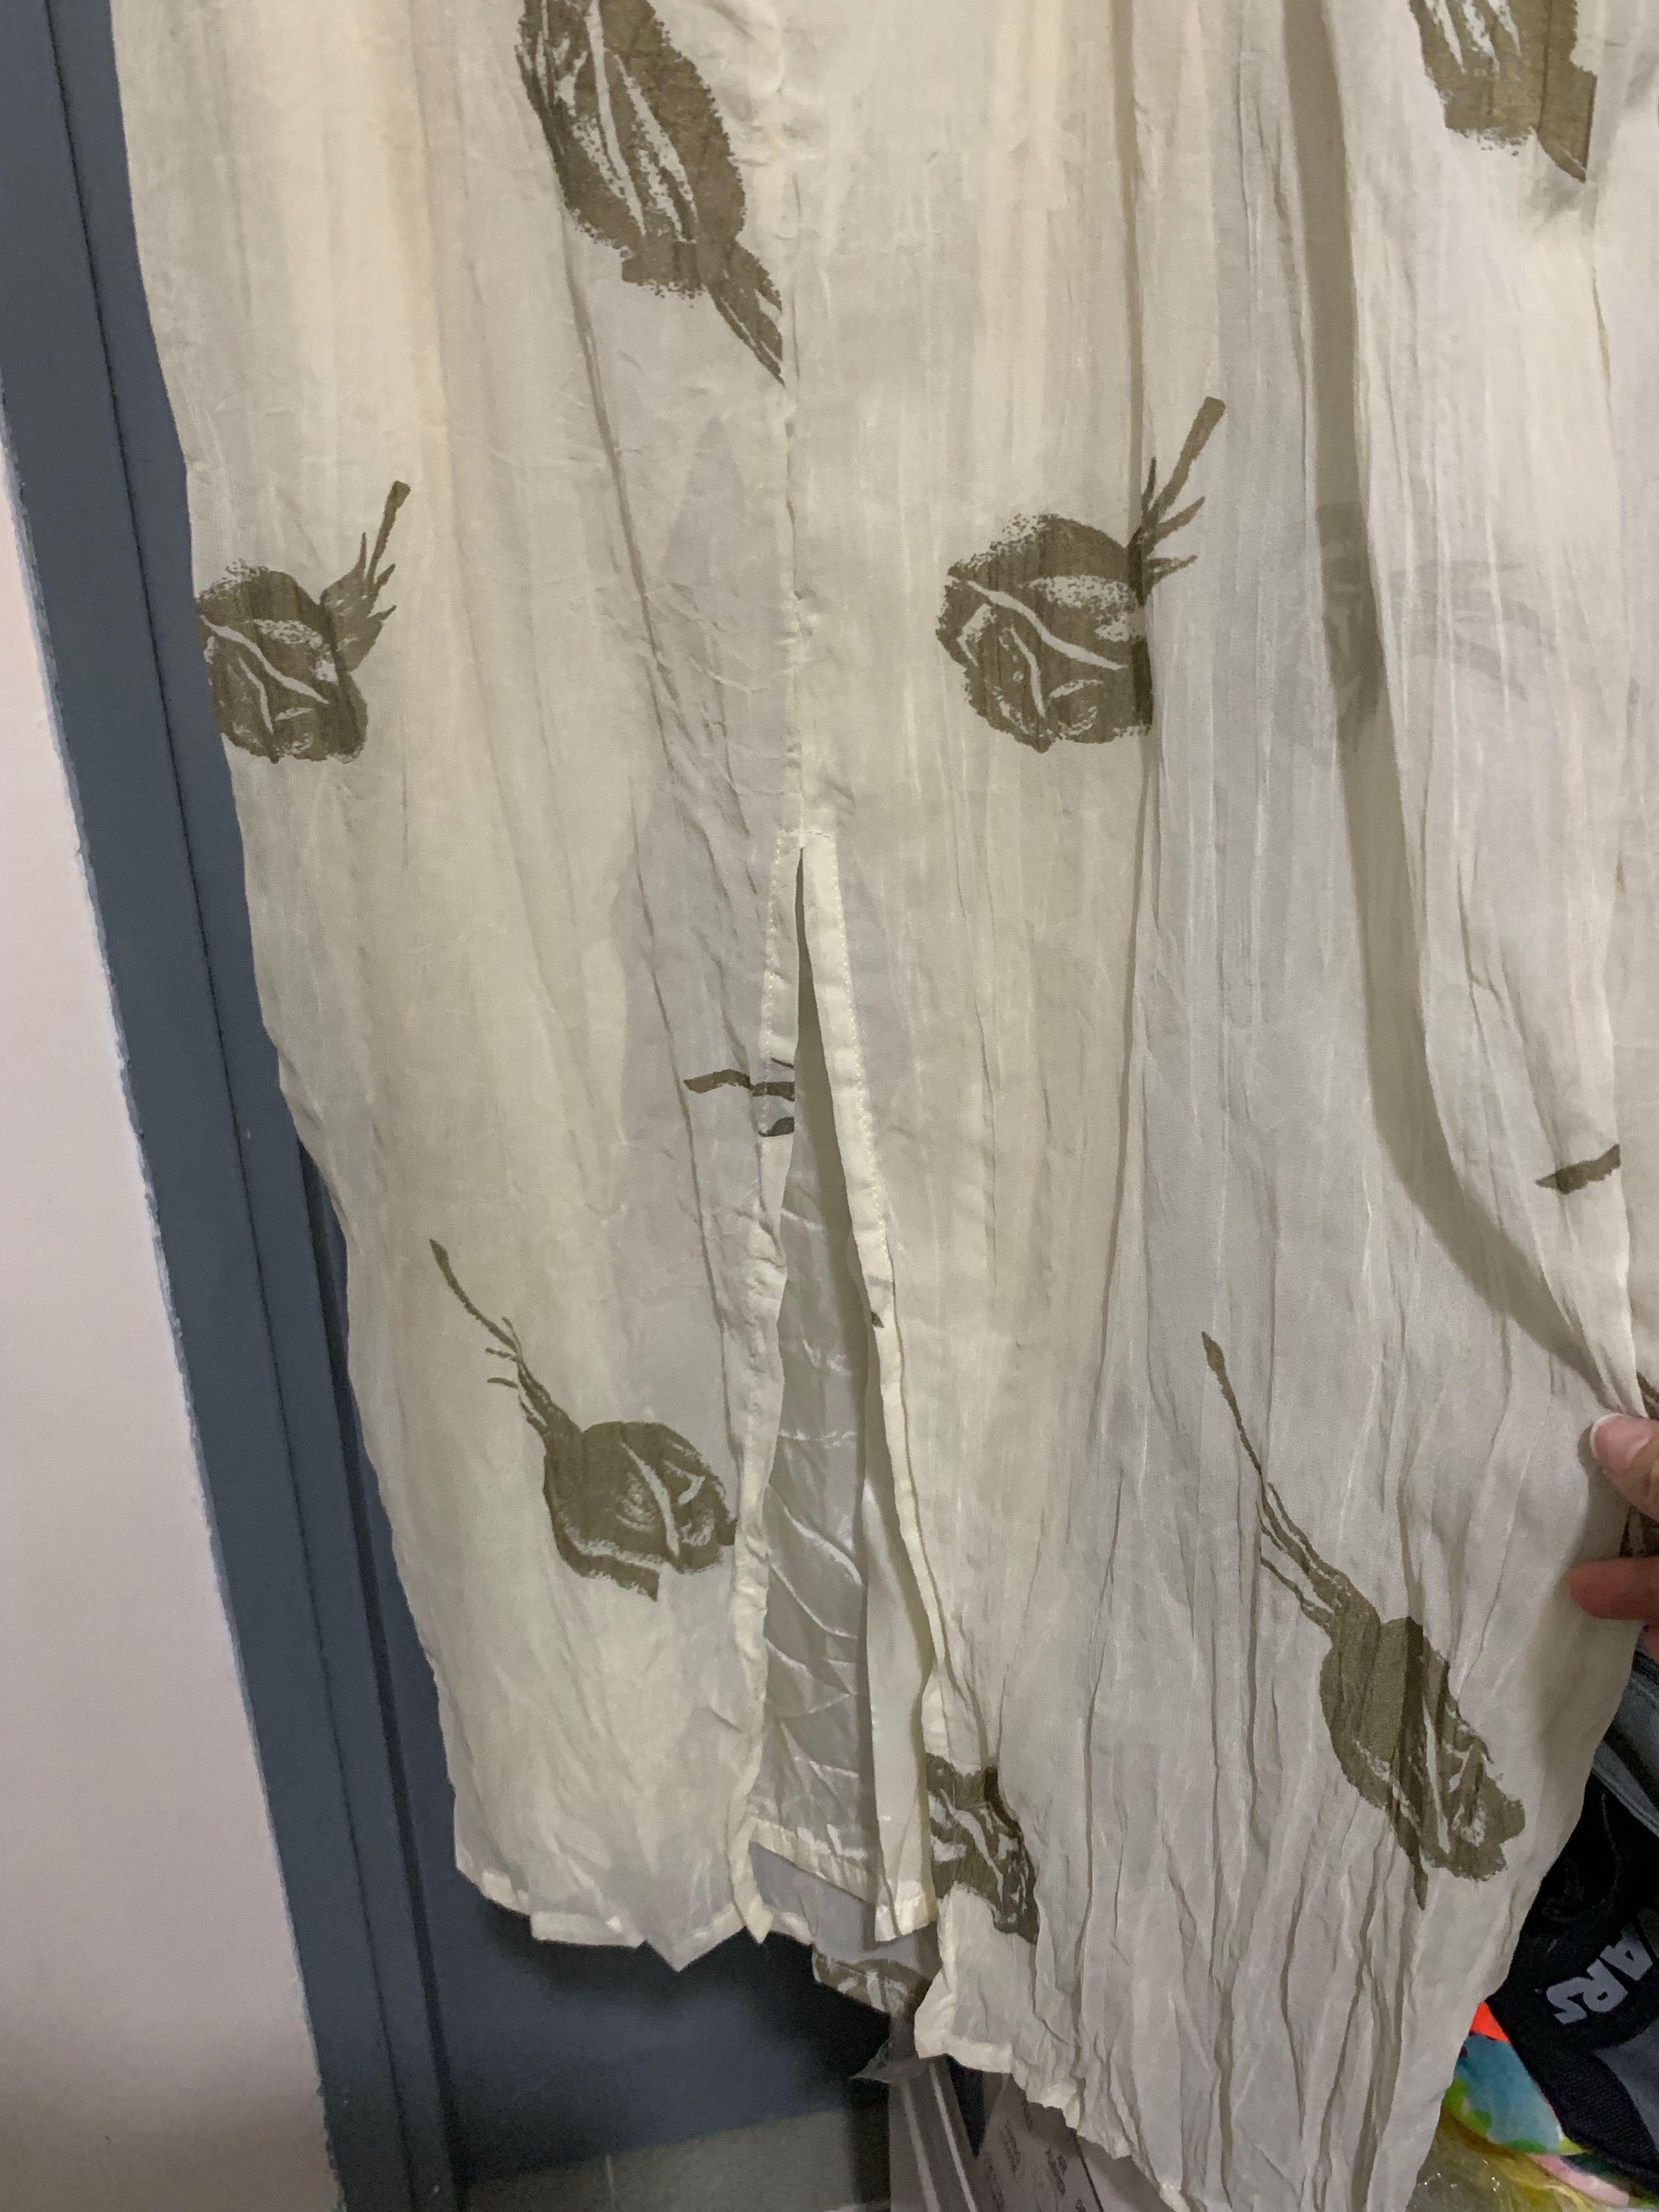 飄逸靚靚,象牙白色雪紡one piece 裙 ,意大利製造make in Italy , Ivory white chiffon one piece skirt